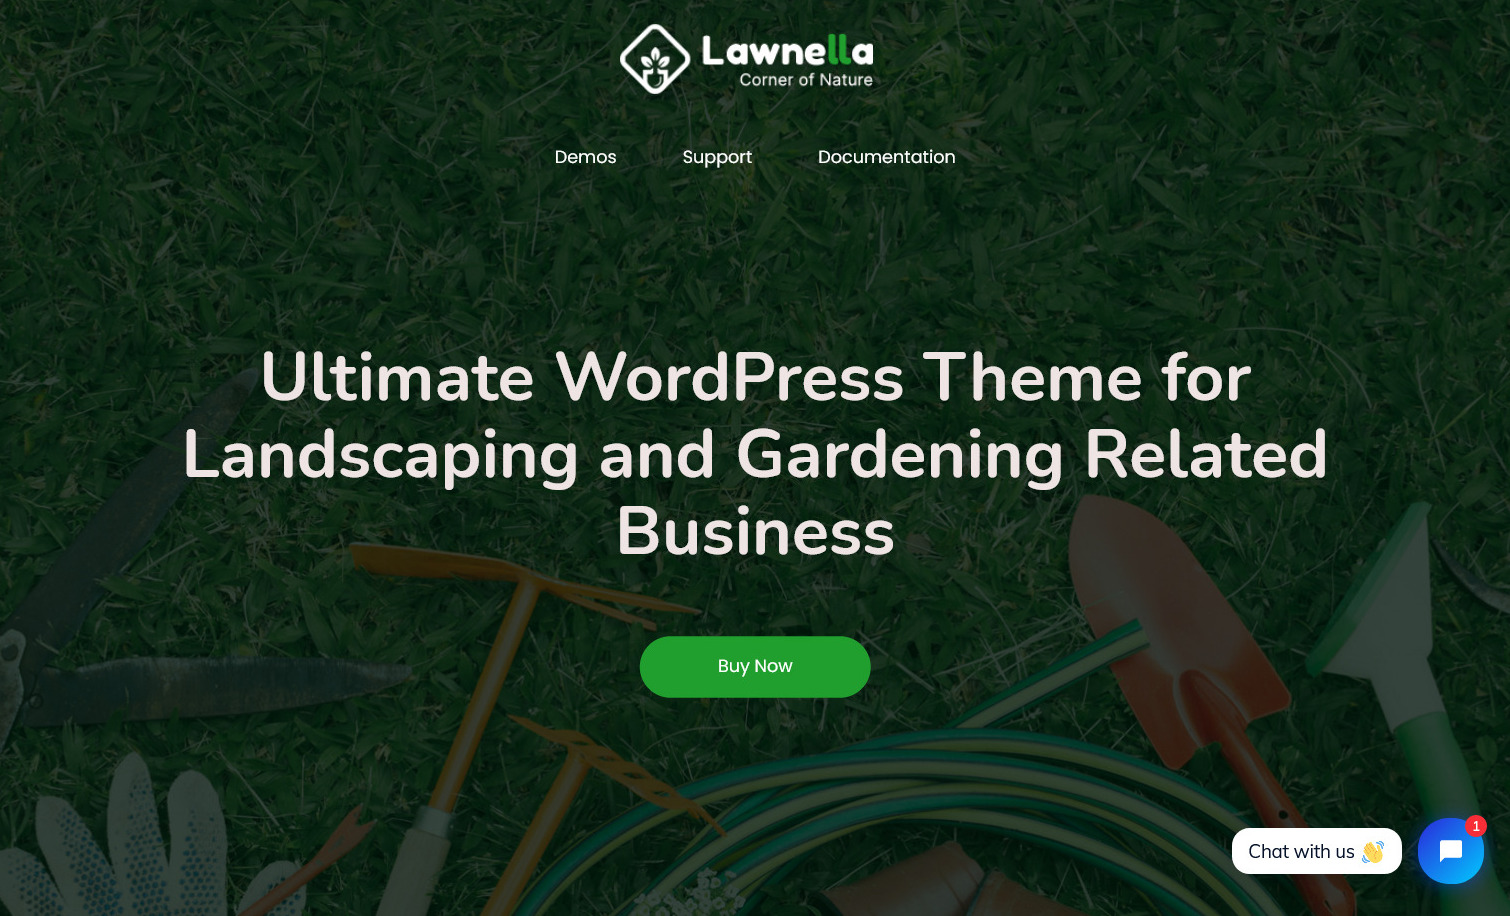 Lawnella Landscaping and Gardening WordPress Theme